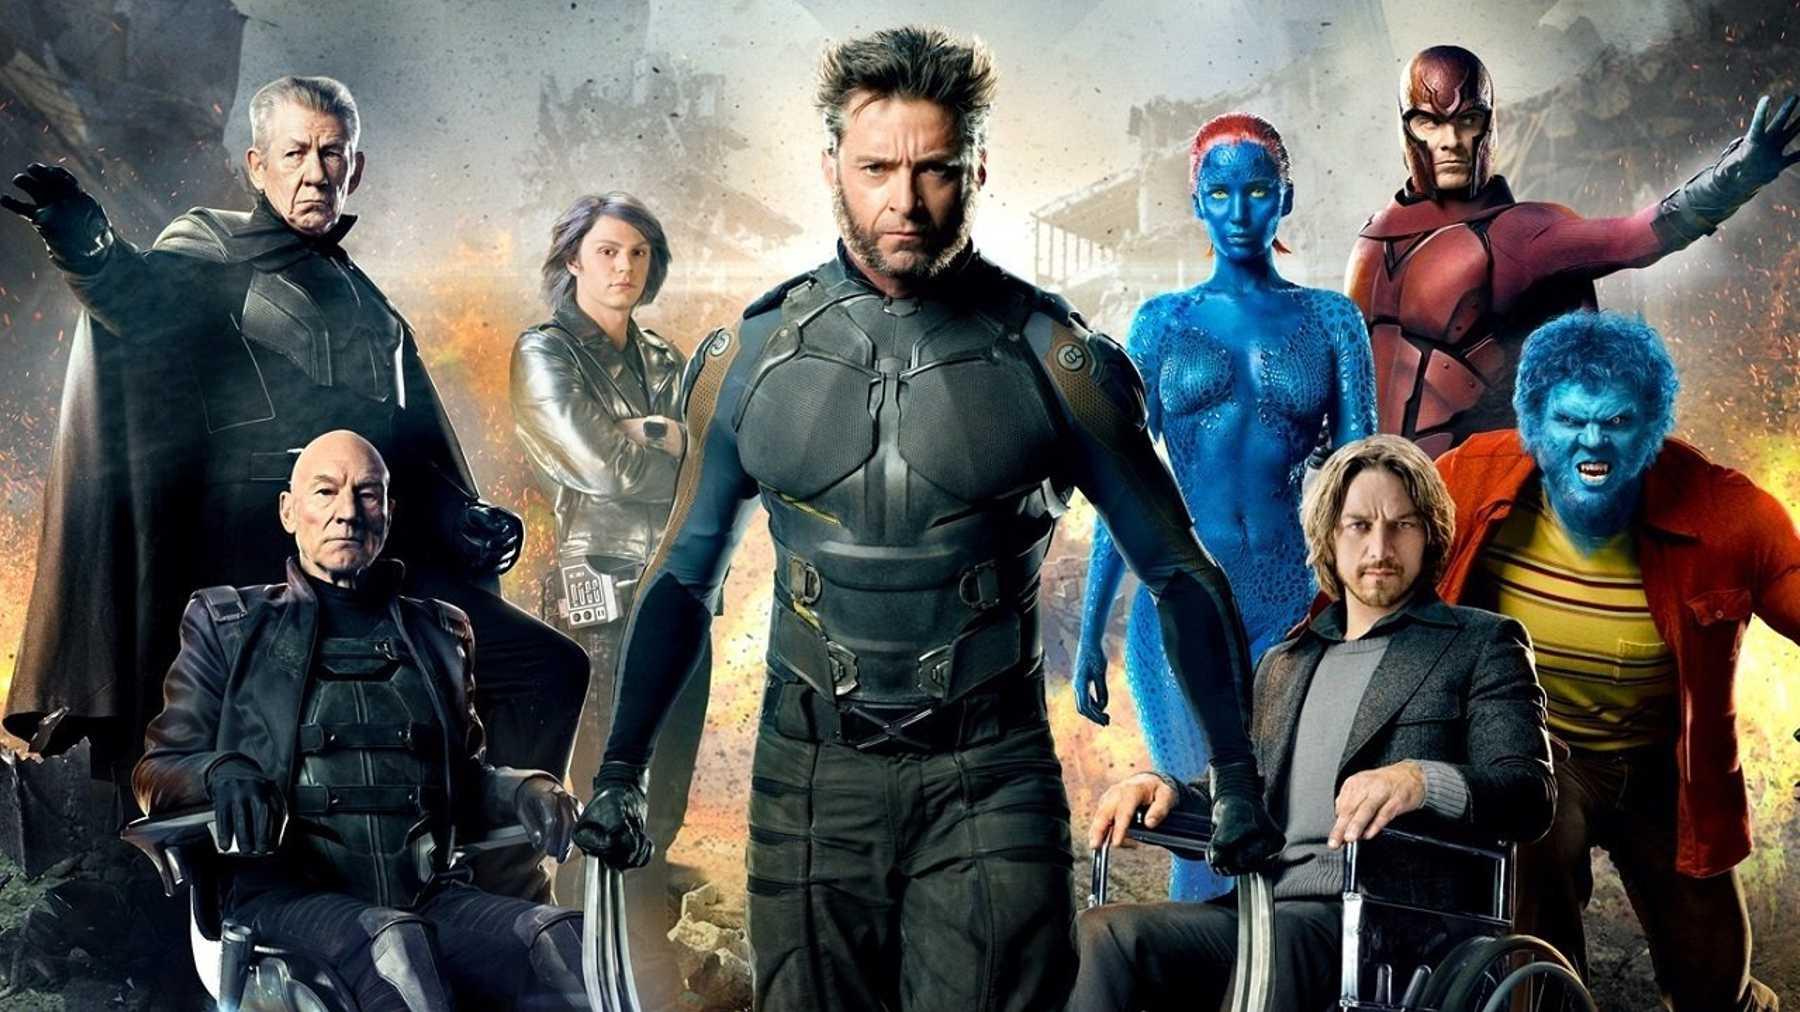 Debut Trailer Drops for Bryan Singer's X-Men: Days of Future Past